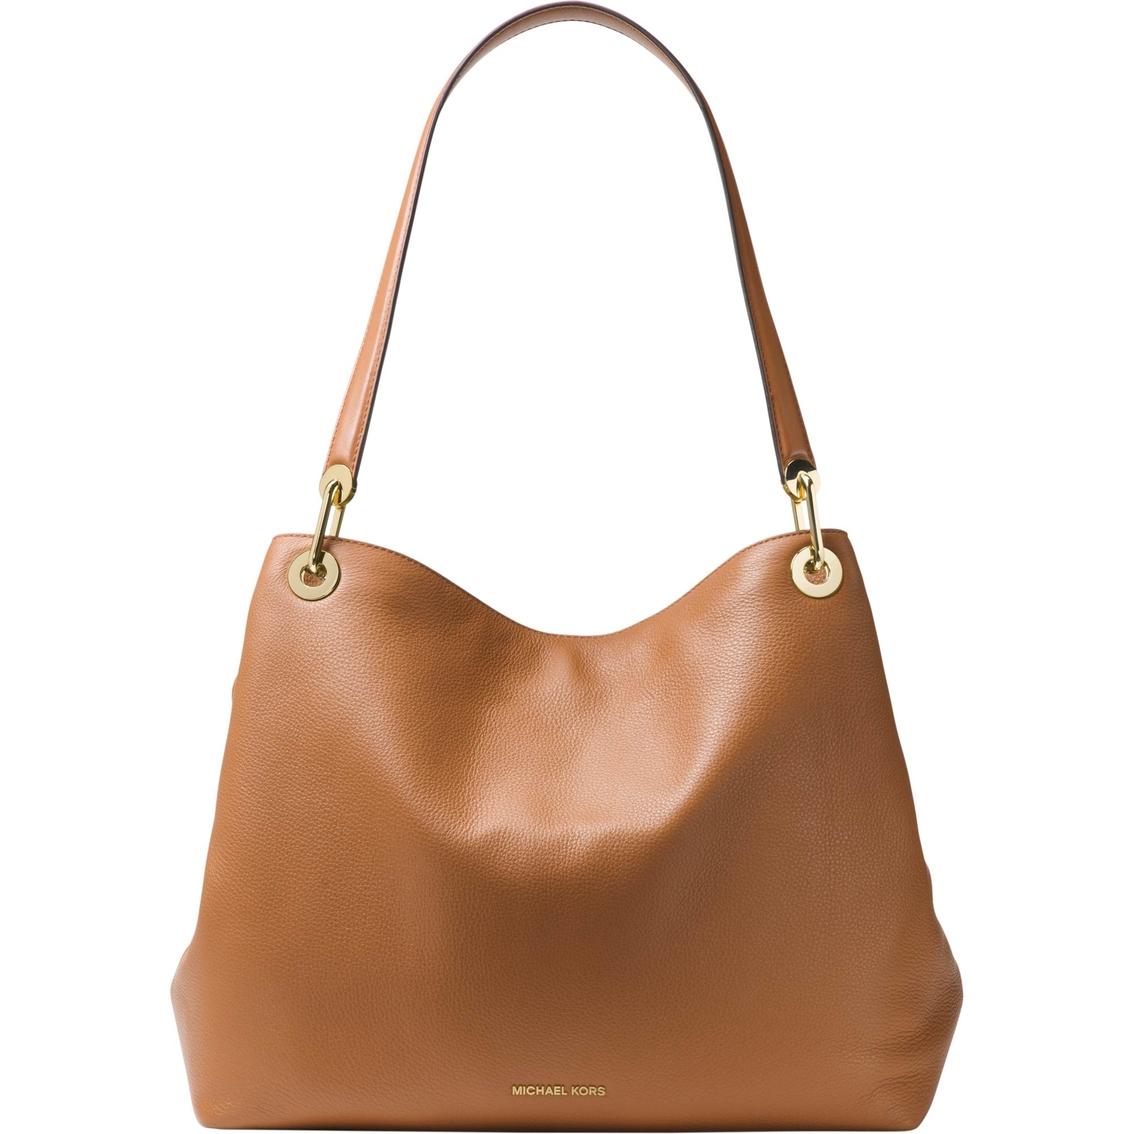 4890a78a249 Michael Kors Raven Xl Shoulder Tote   Handbags   Shop The Exchange